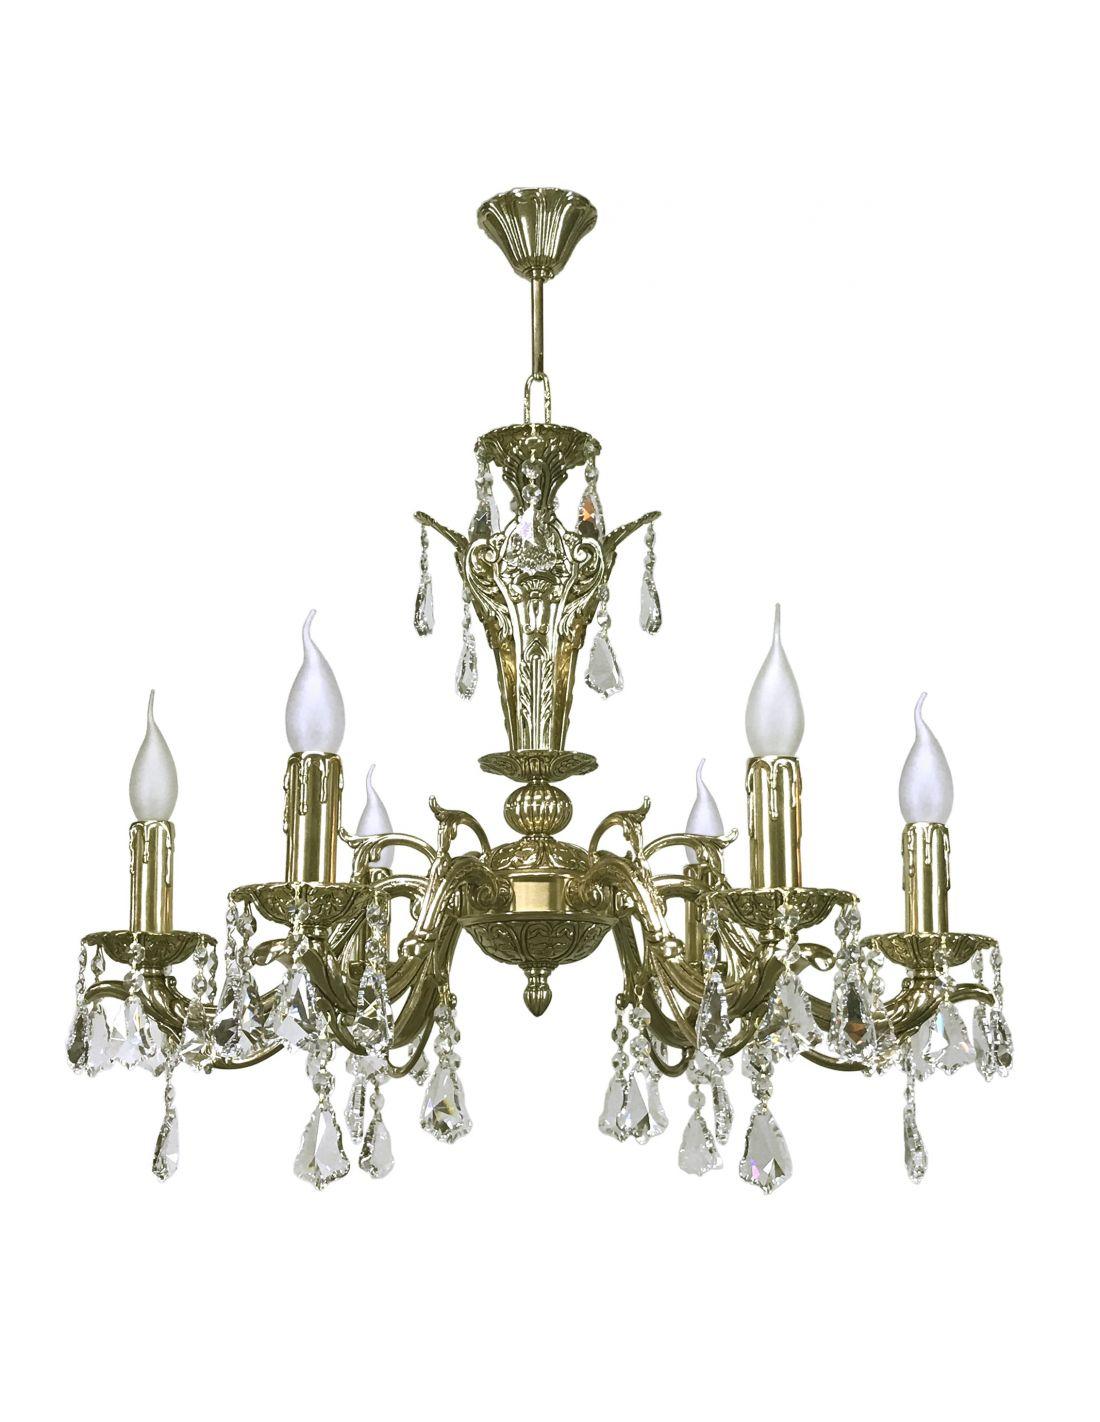 L mpara de 6 luces de bronce con cristal asfour fabricada - Lamparas baratas madrid ...